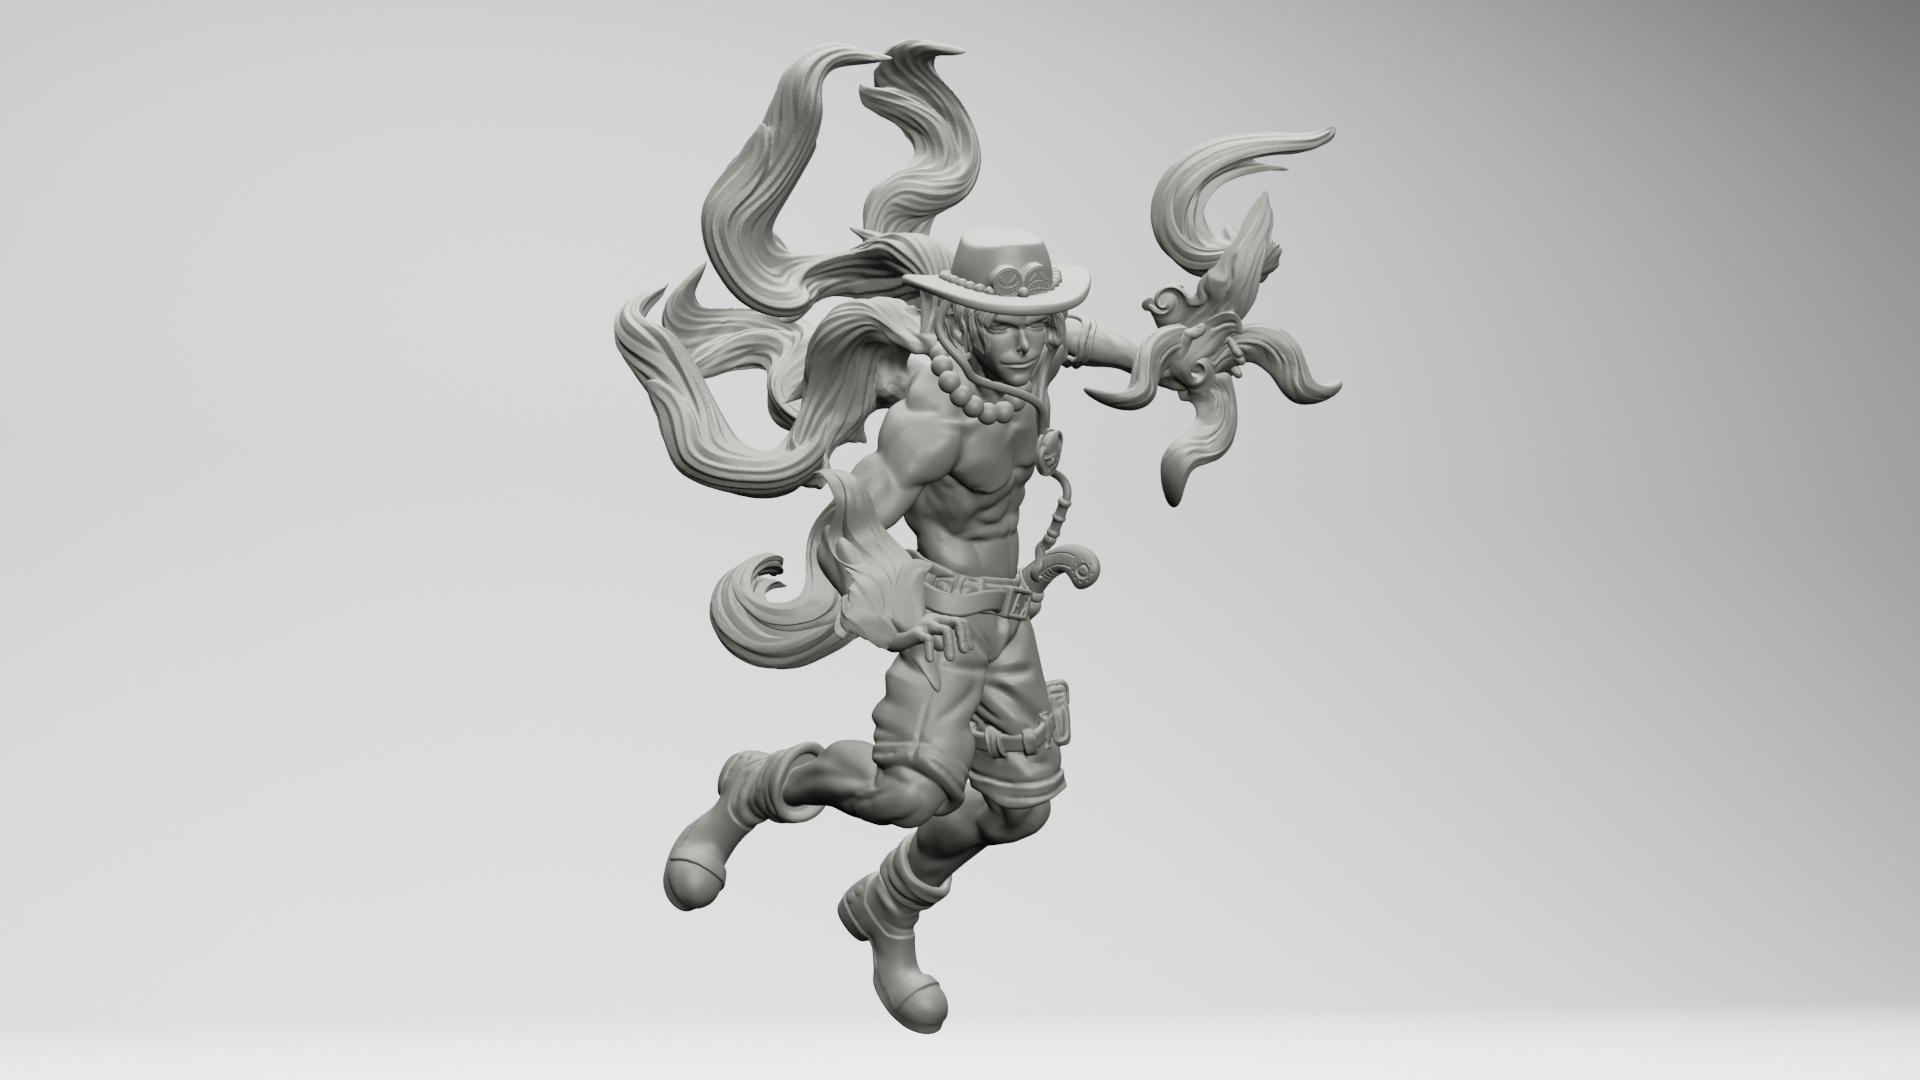 12.jpg Download STL file Portgas D. Ace - One Piece 3D printable • 3D print model, ronnie_yonk